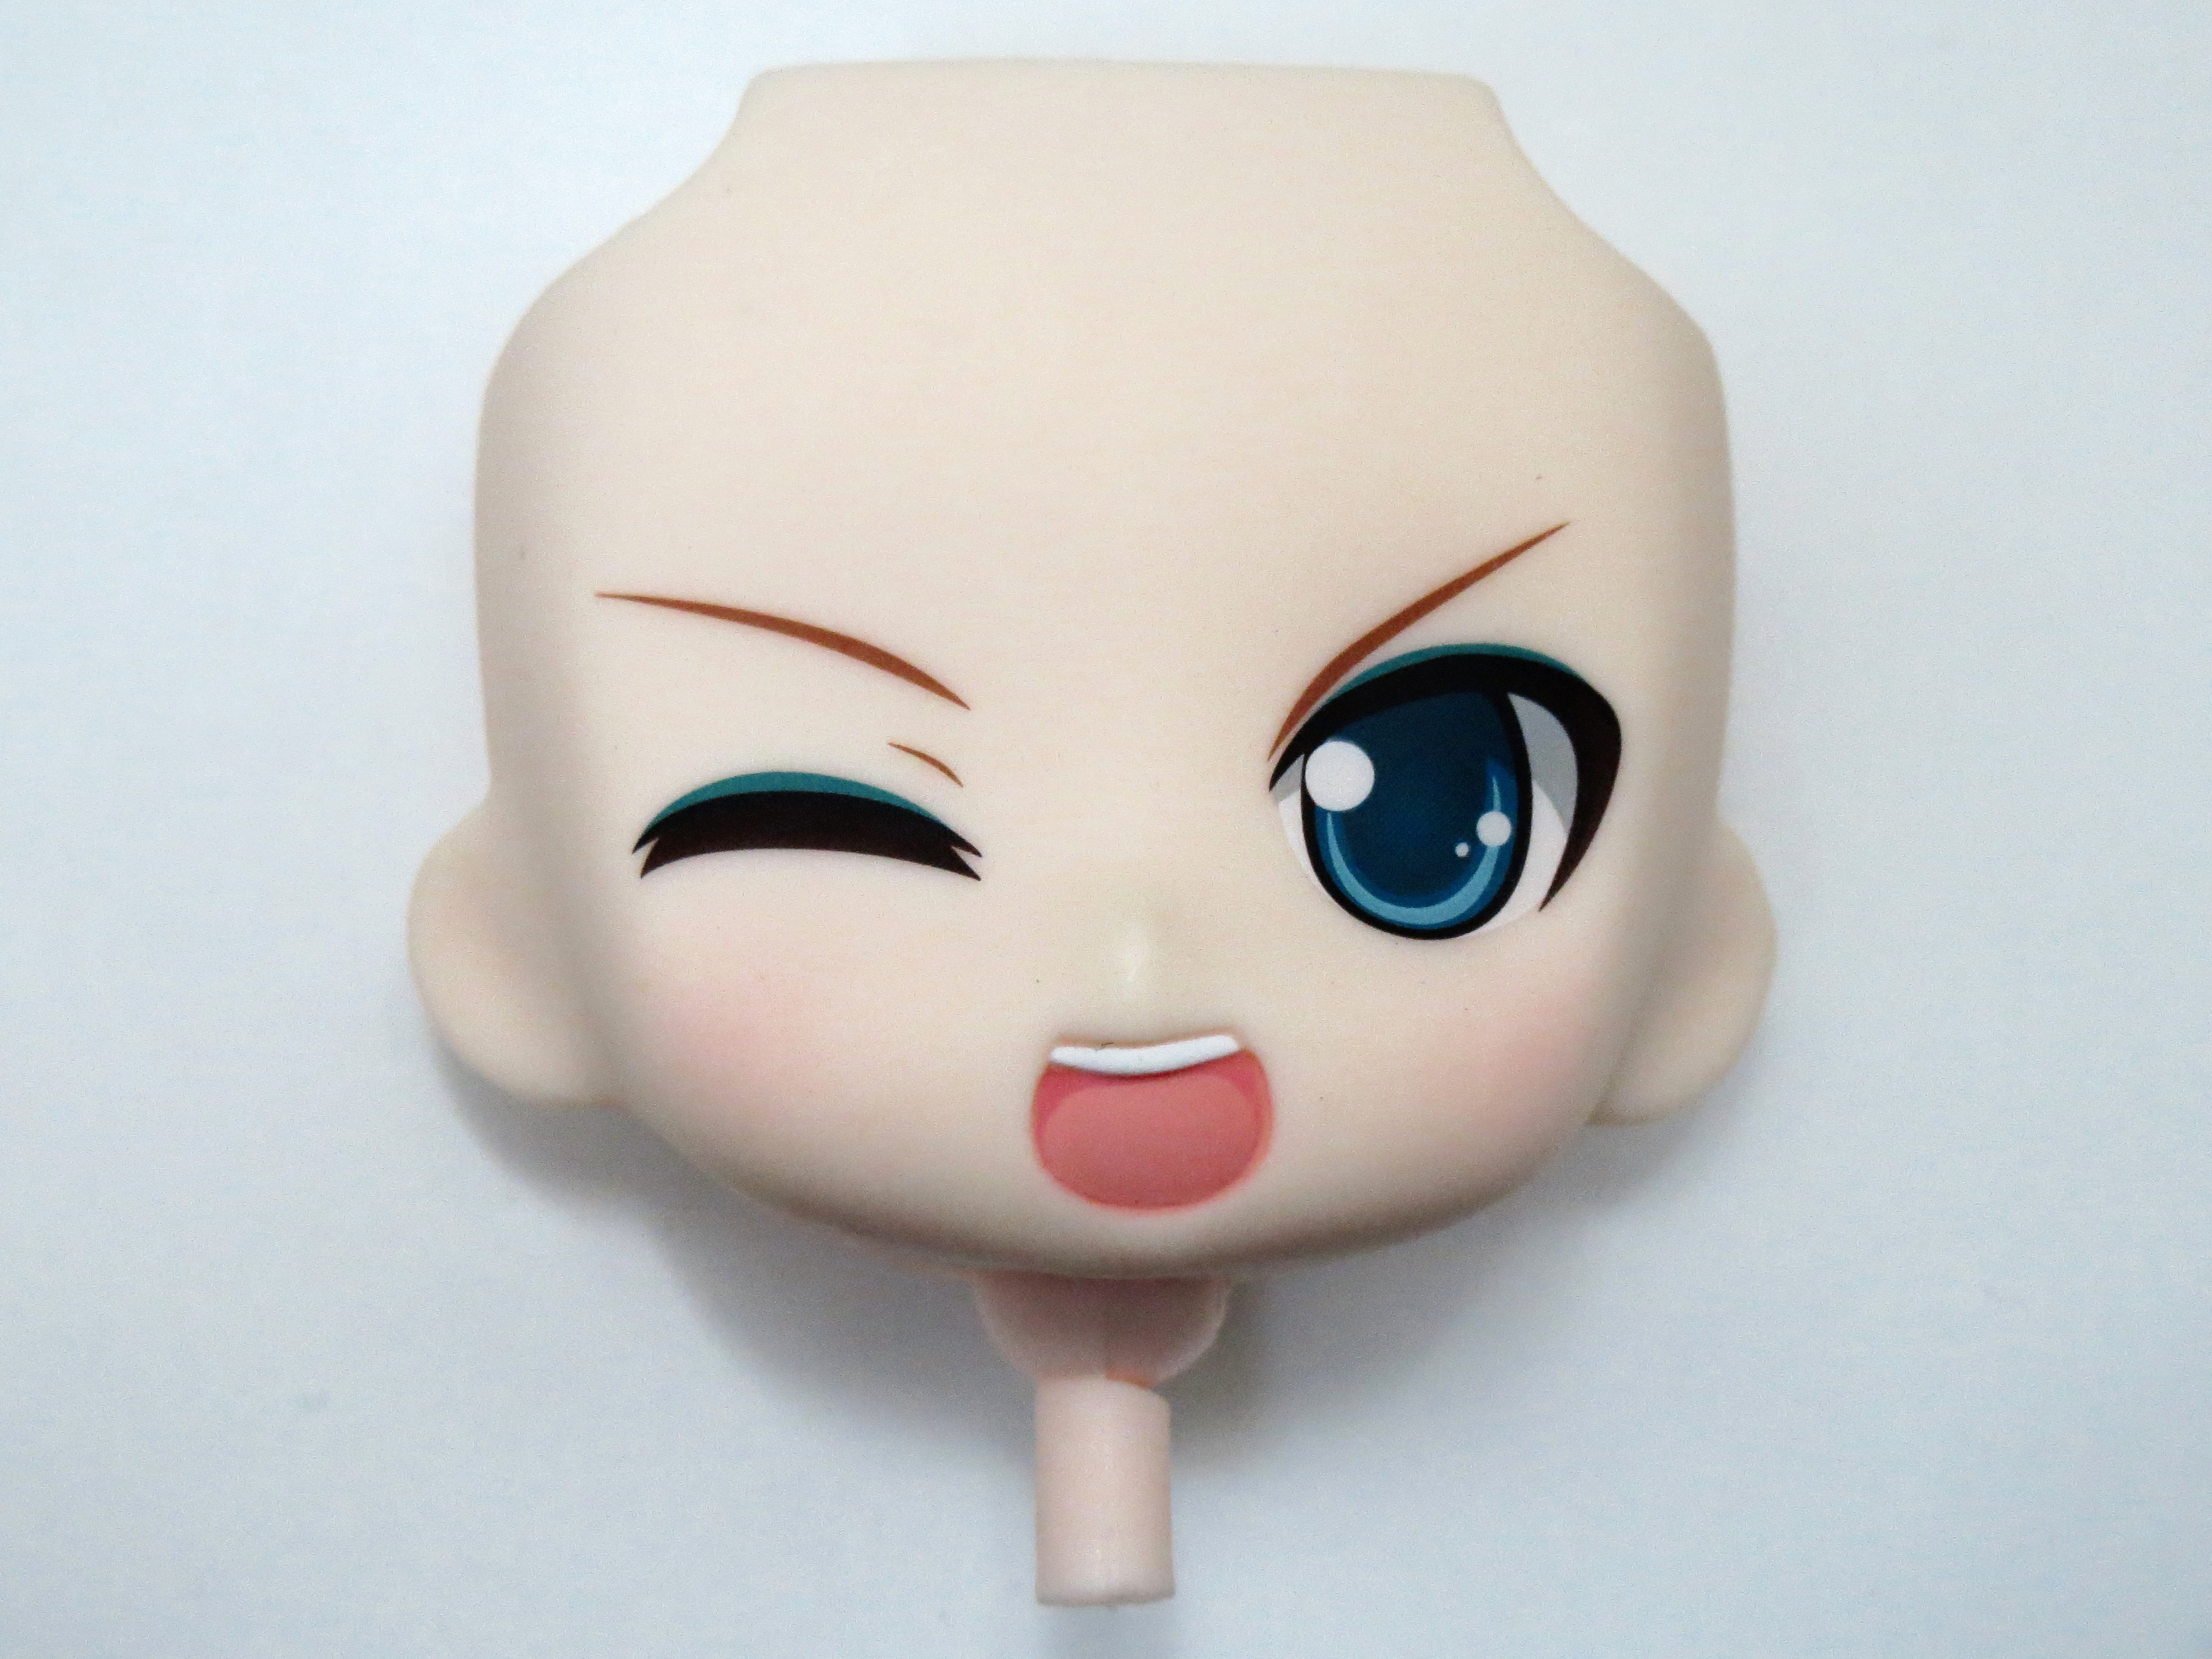 【286】 Lily from anim.o.v.e 顔パーツ ウインク顔 ねんどろいど